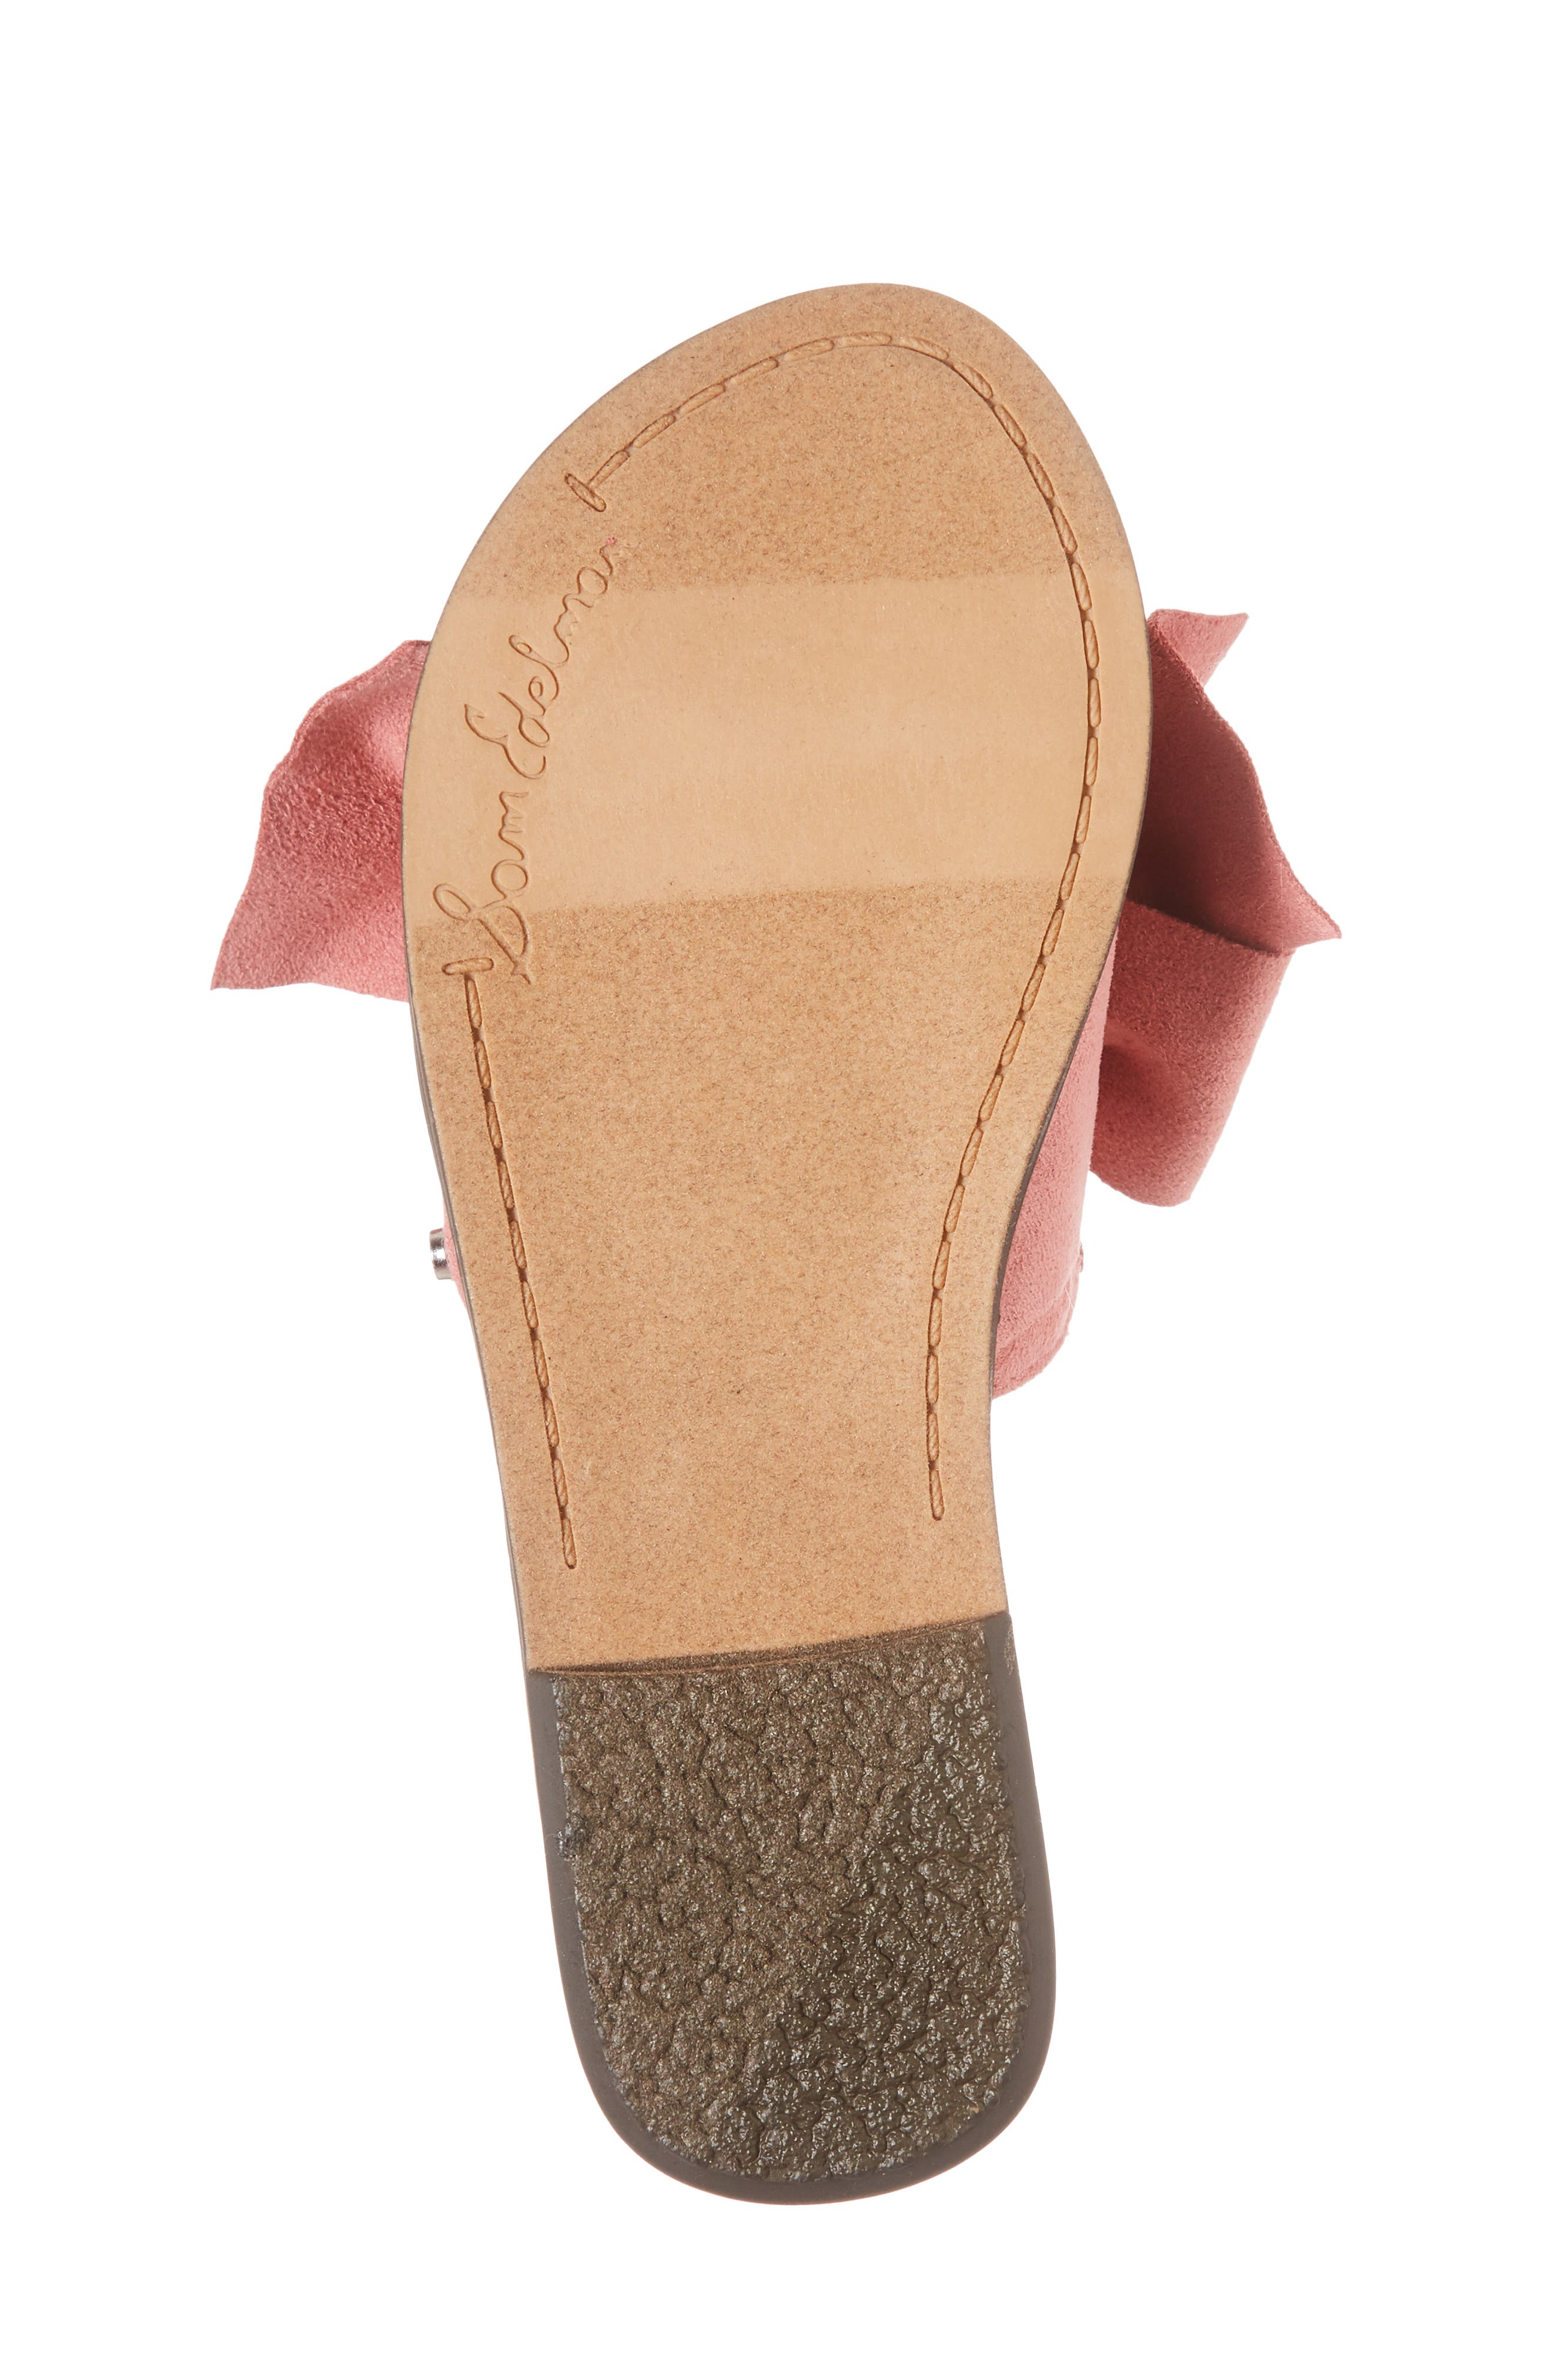 Gigi Bow Faux Leather Sandal,                             Alternate thumbnail 17, color,